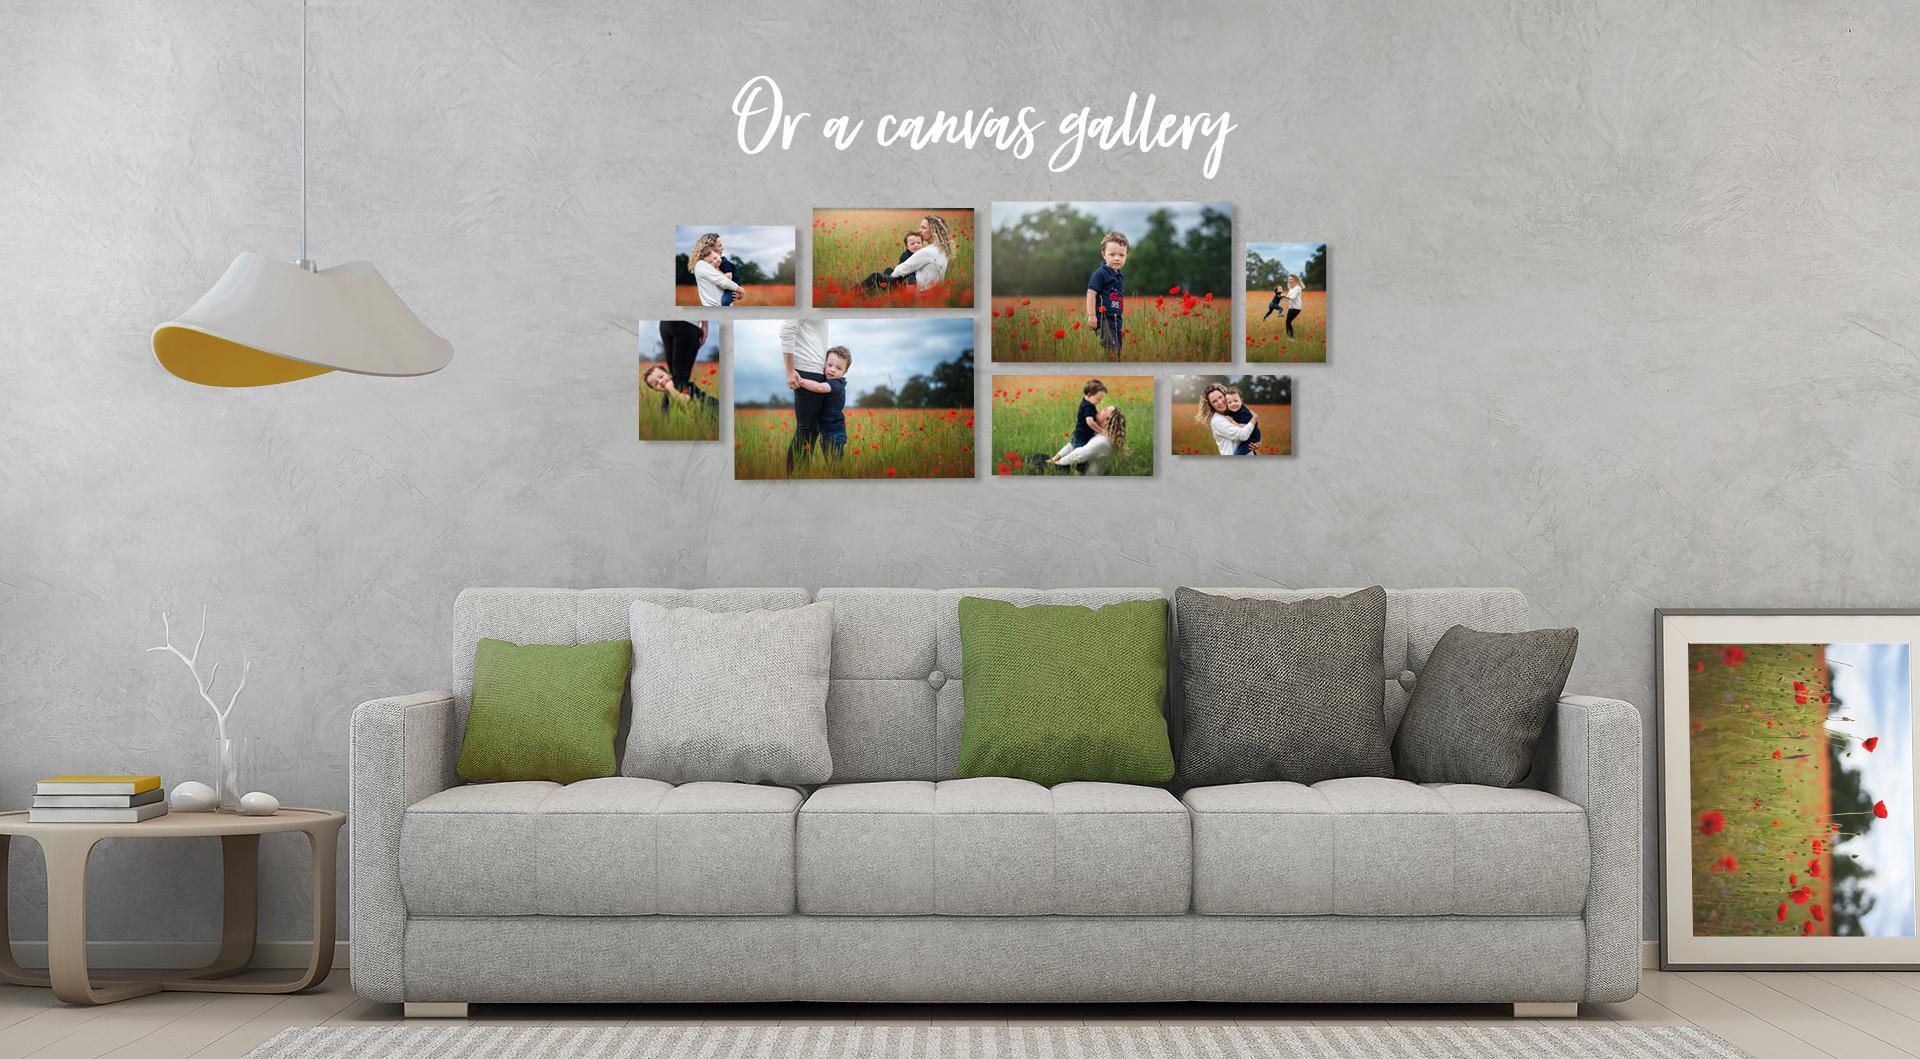 Canvas-gallerys-text.jpg